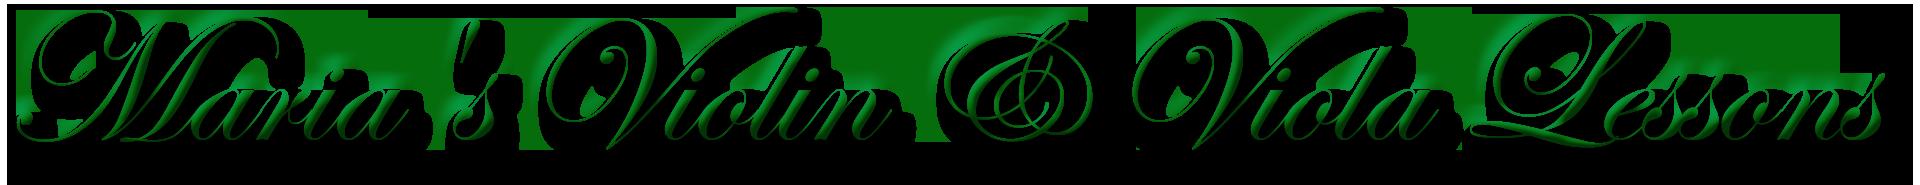 Maria's Violin & Viola Lessons Header Logo